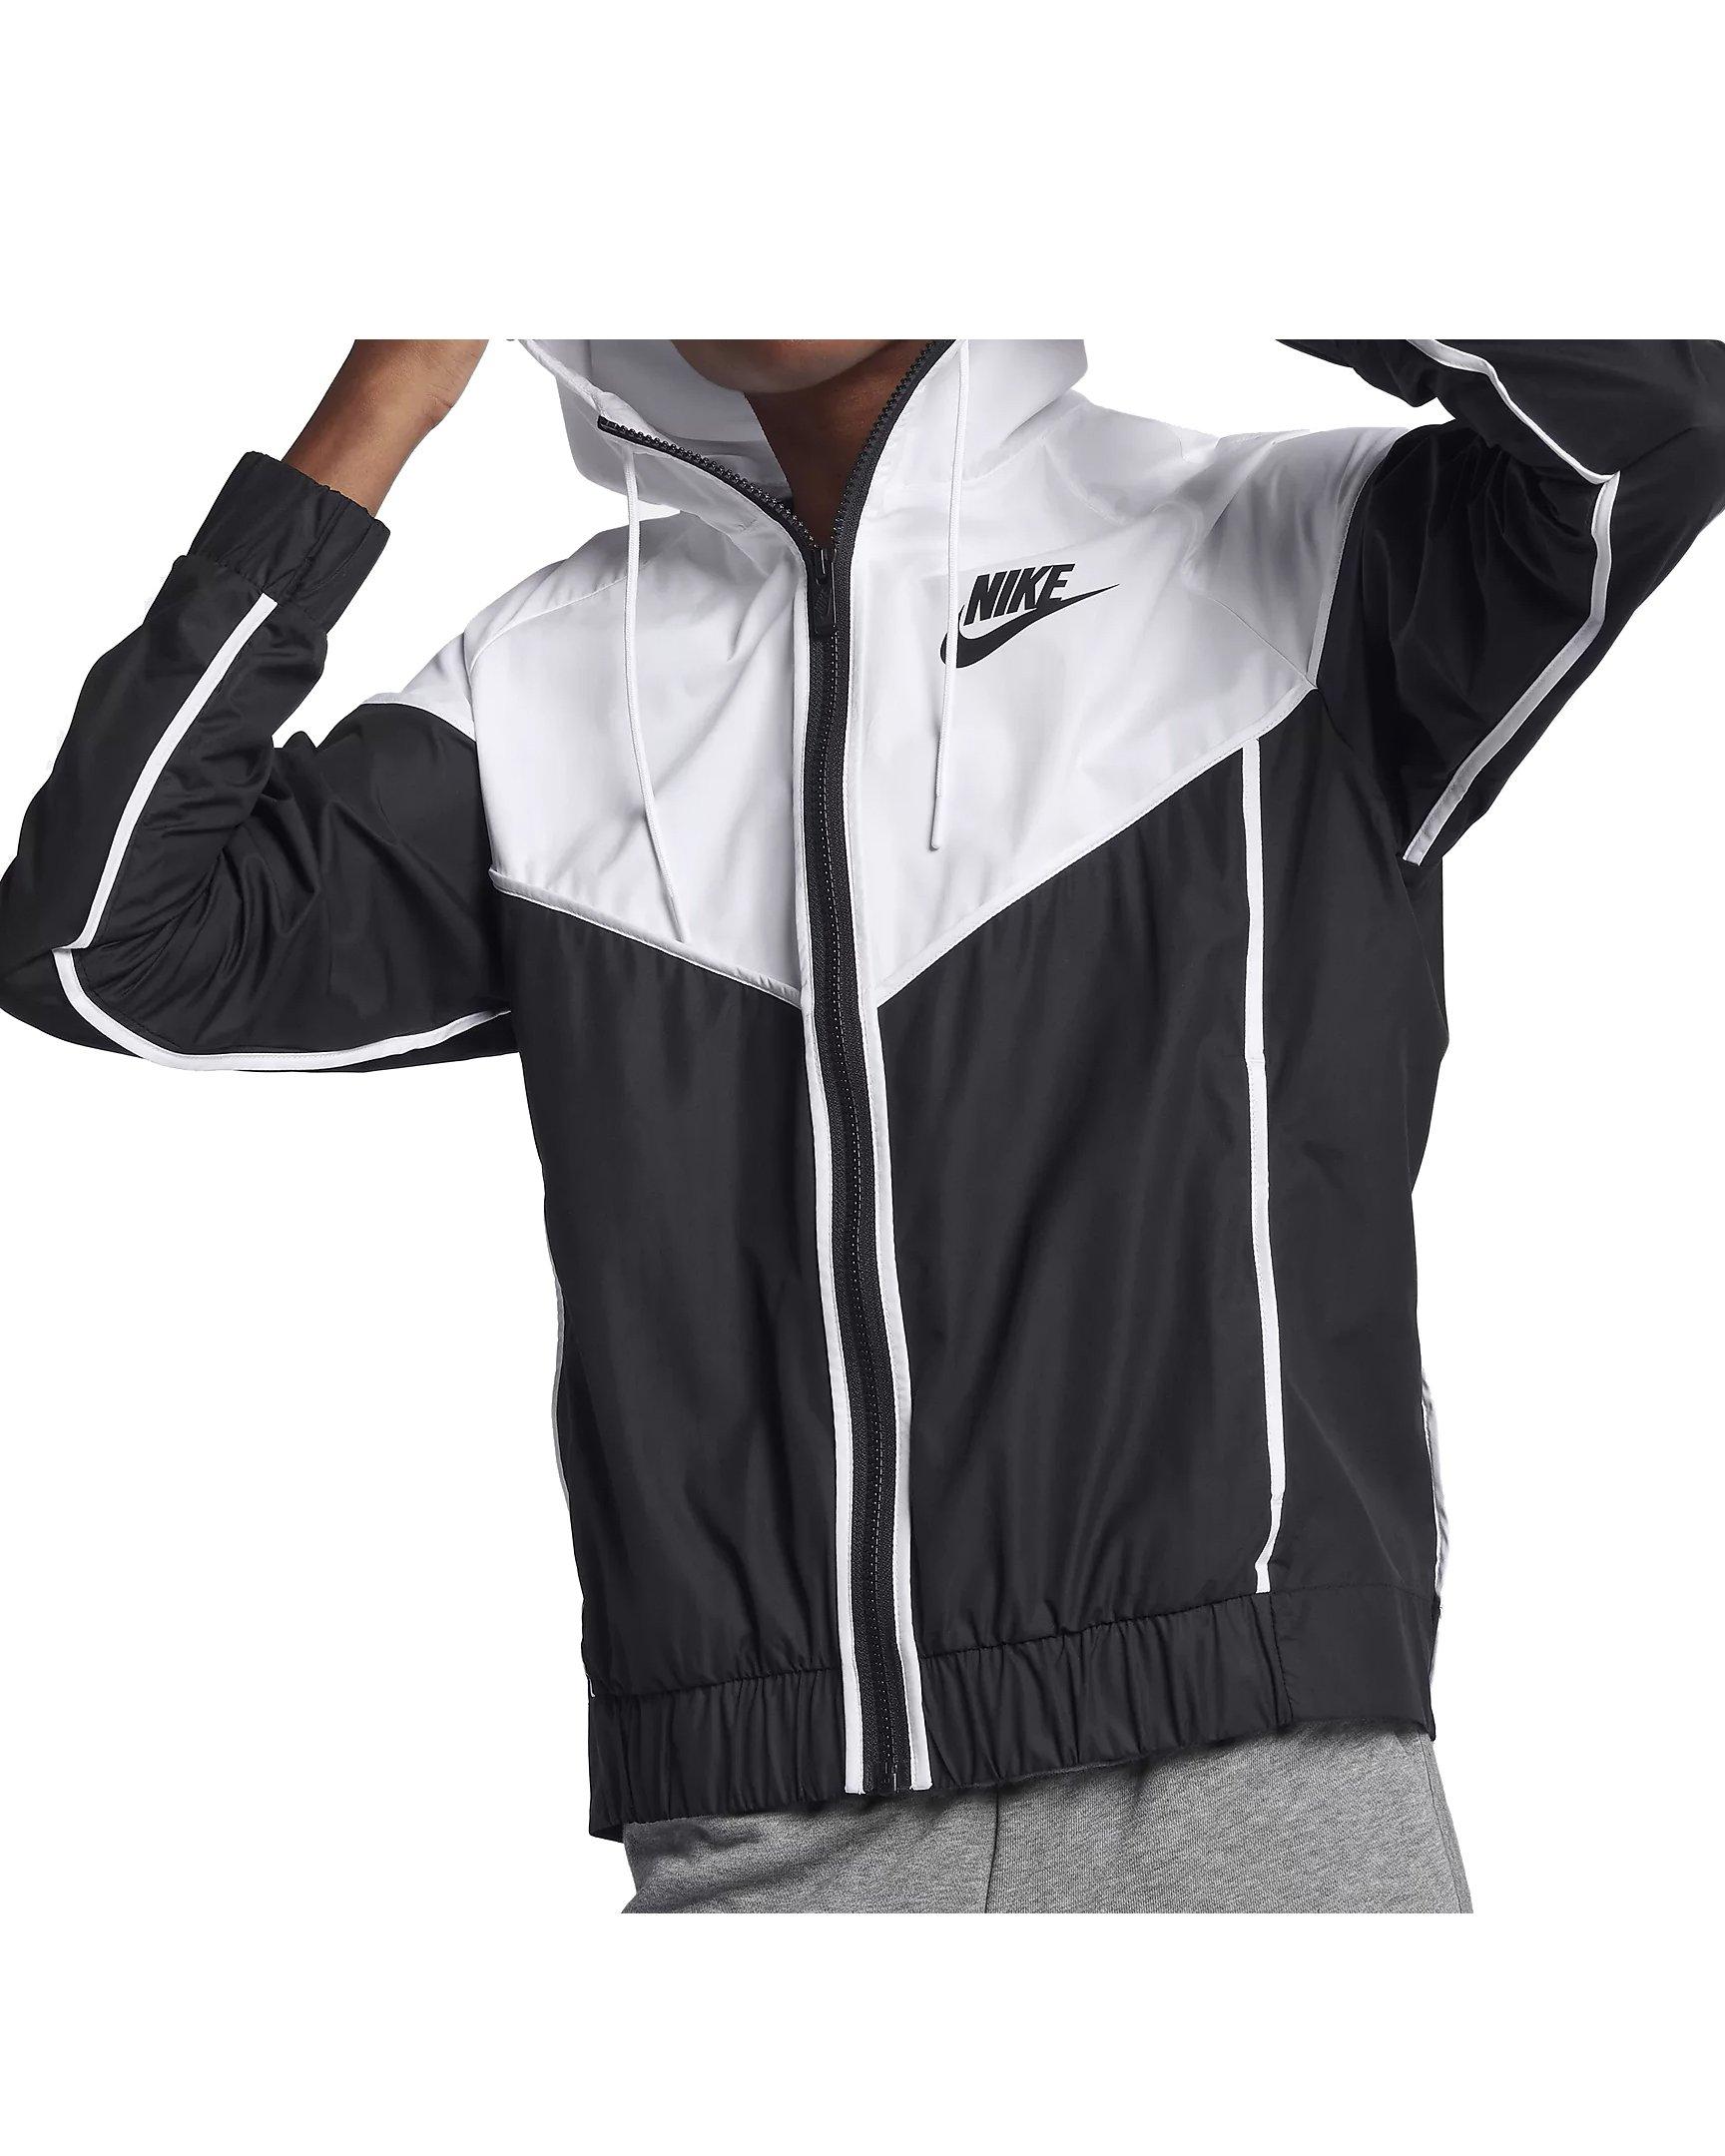 Nike Womens Windrunner Track Jacket Black/White 883495-011 Size X-Small